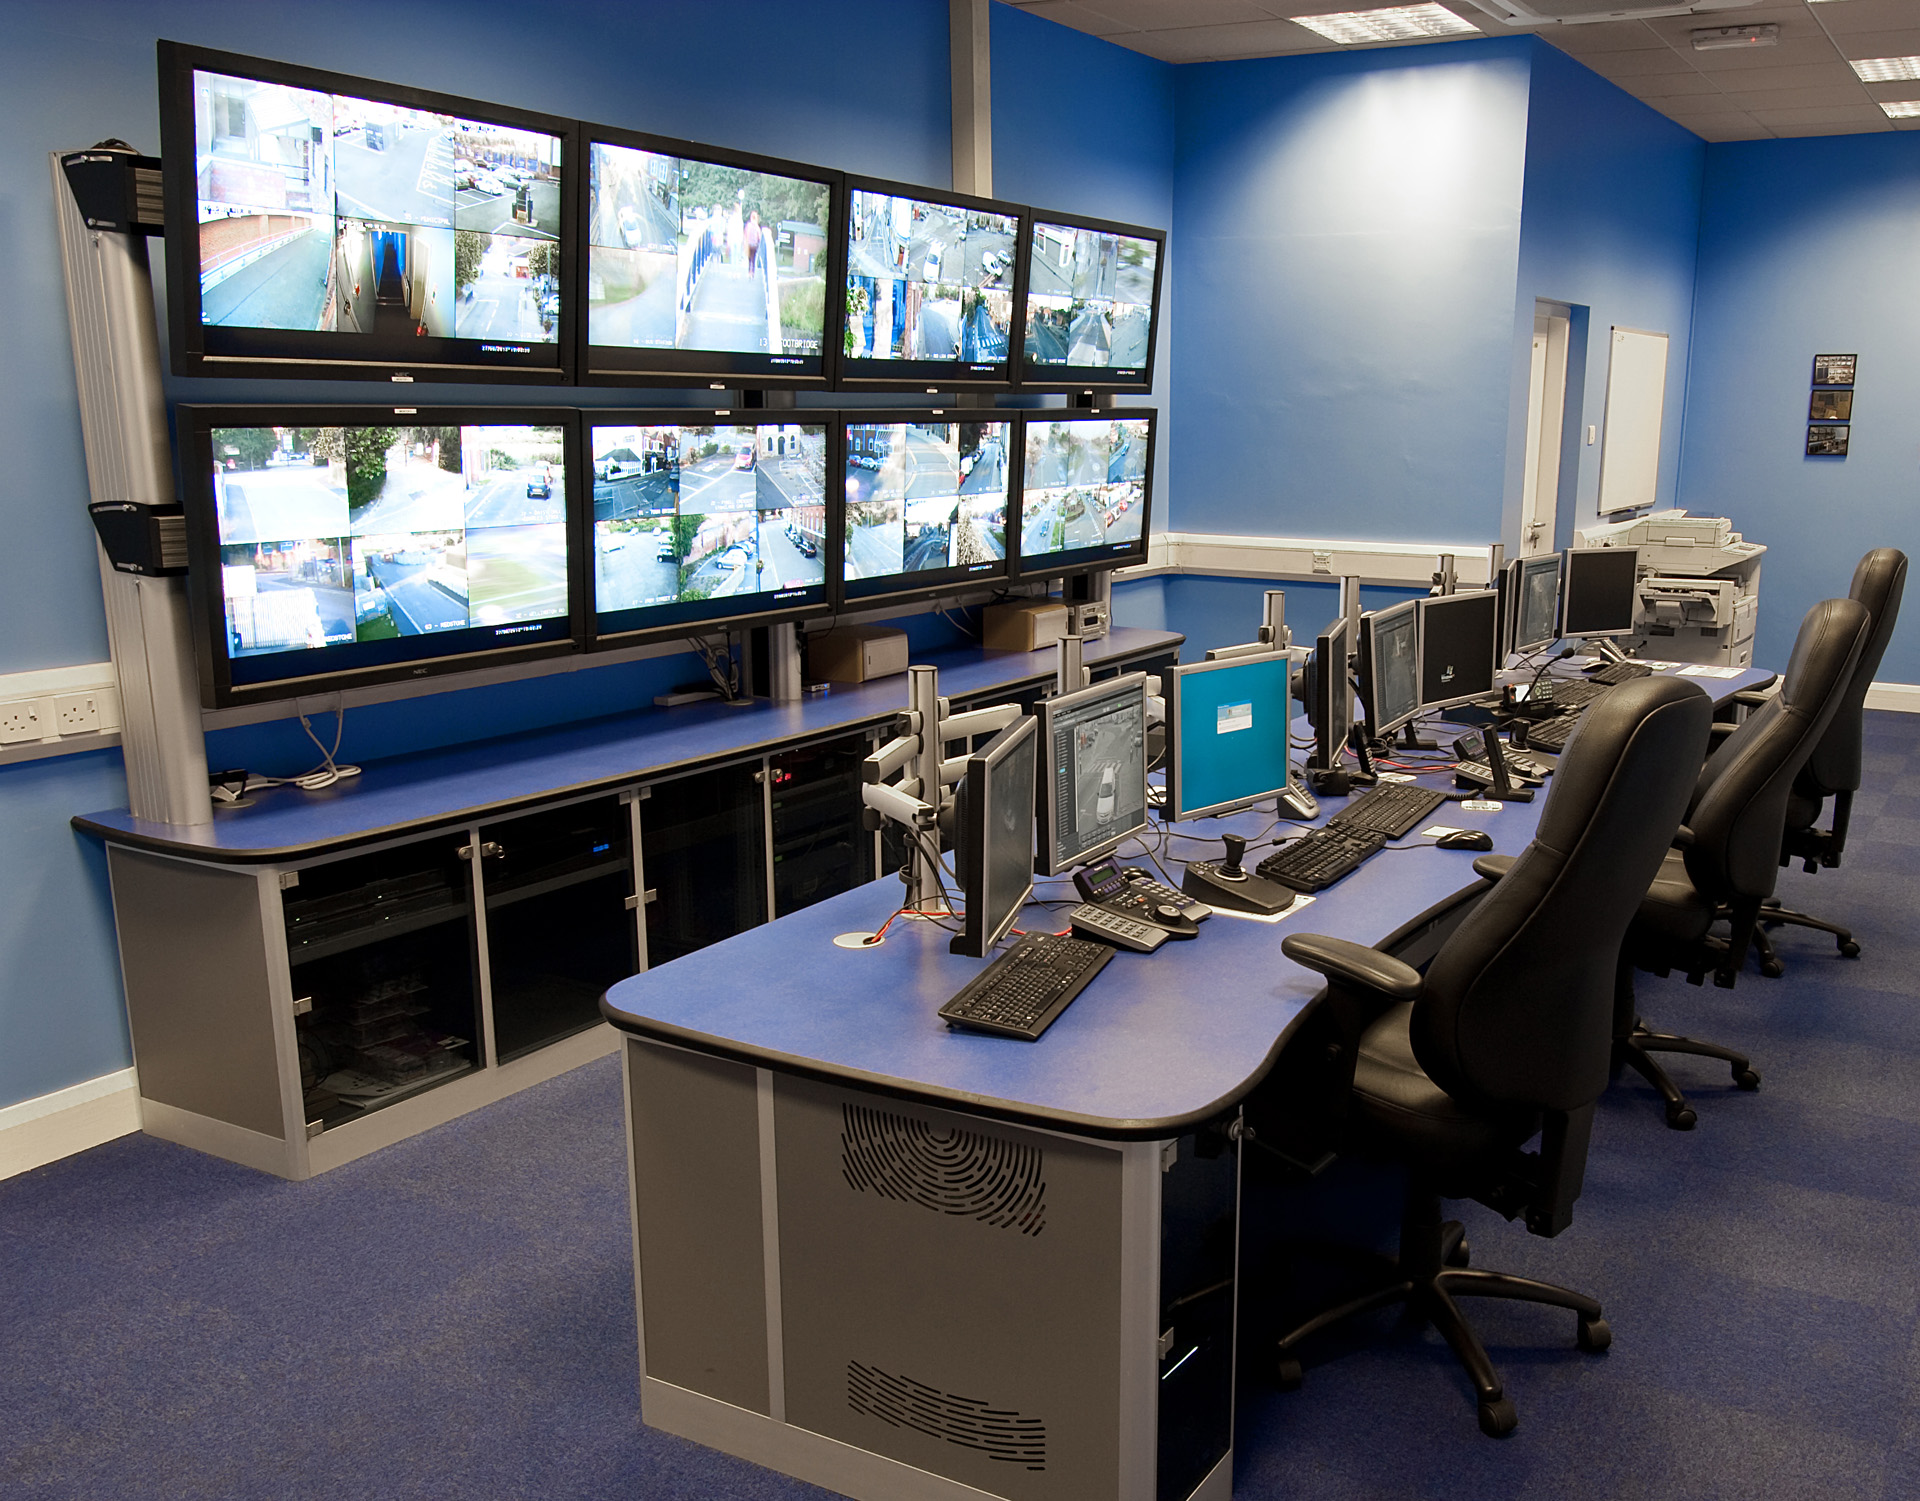 Floor plan for CCTV Control Room